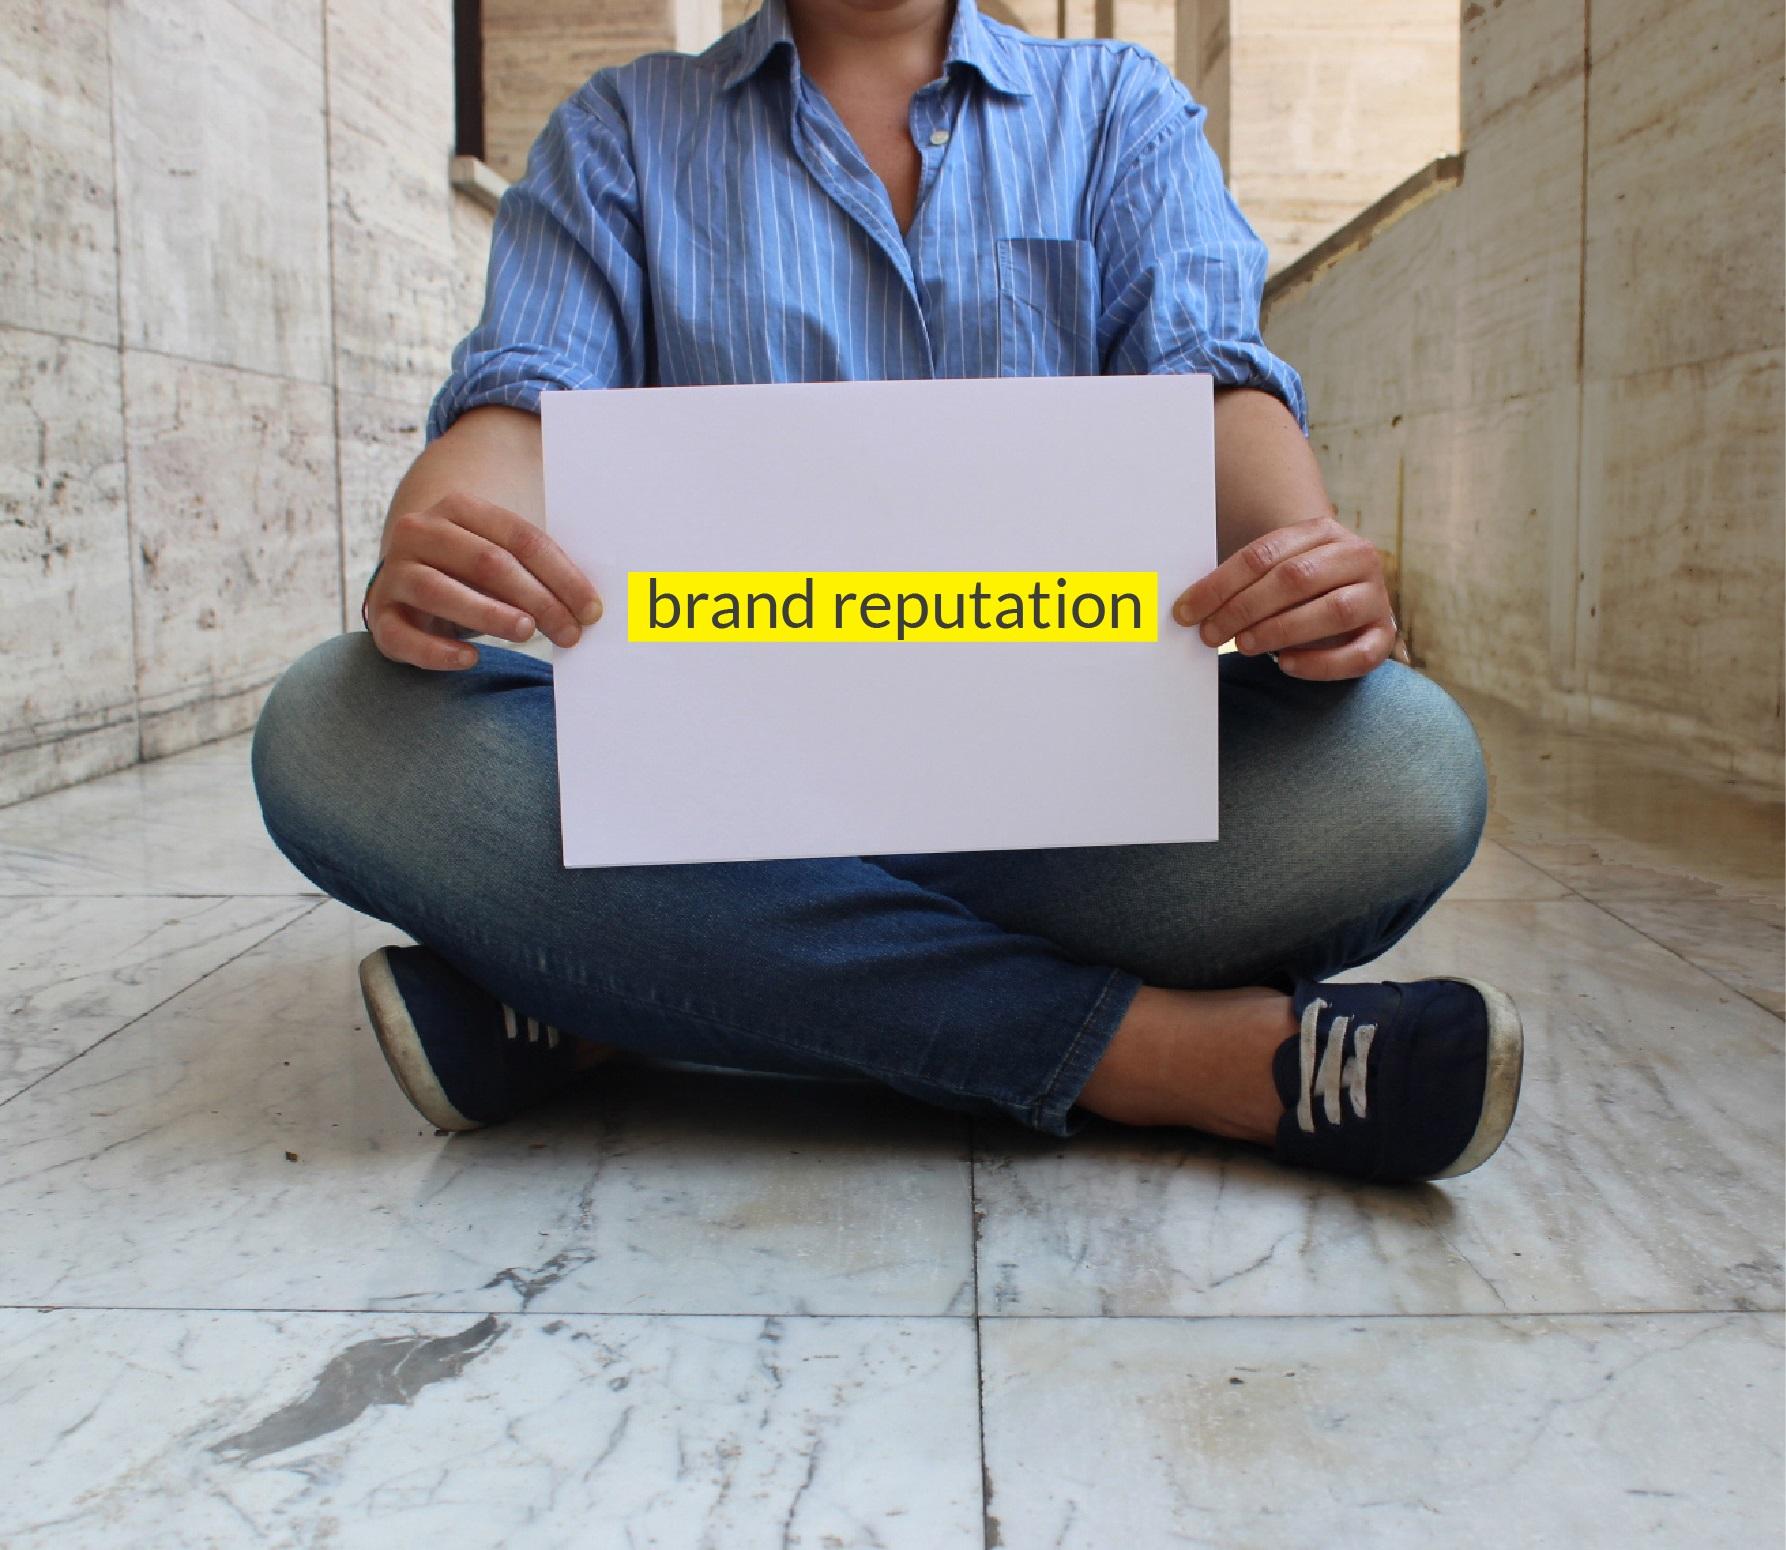 Brand Reputation social network